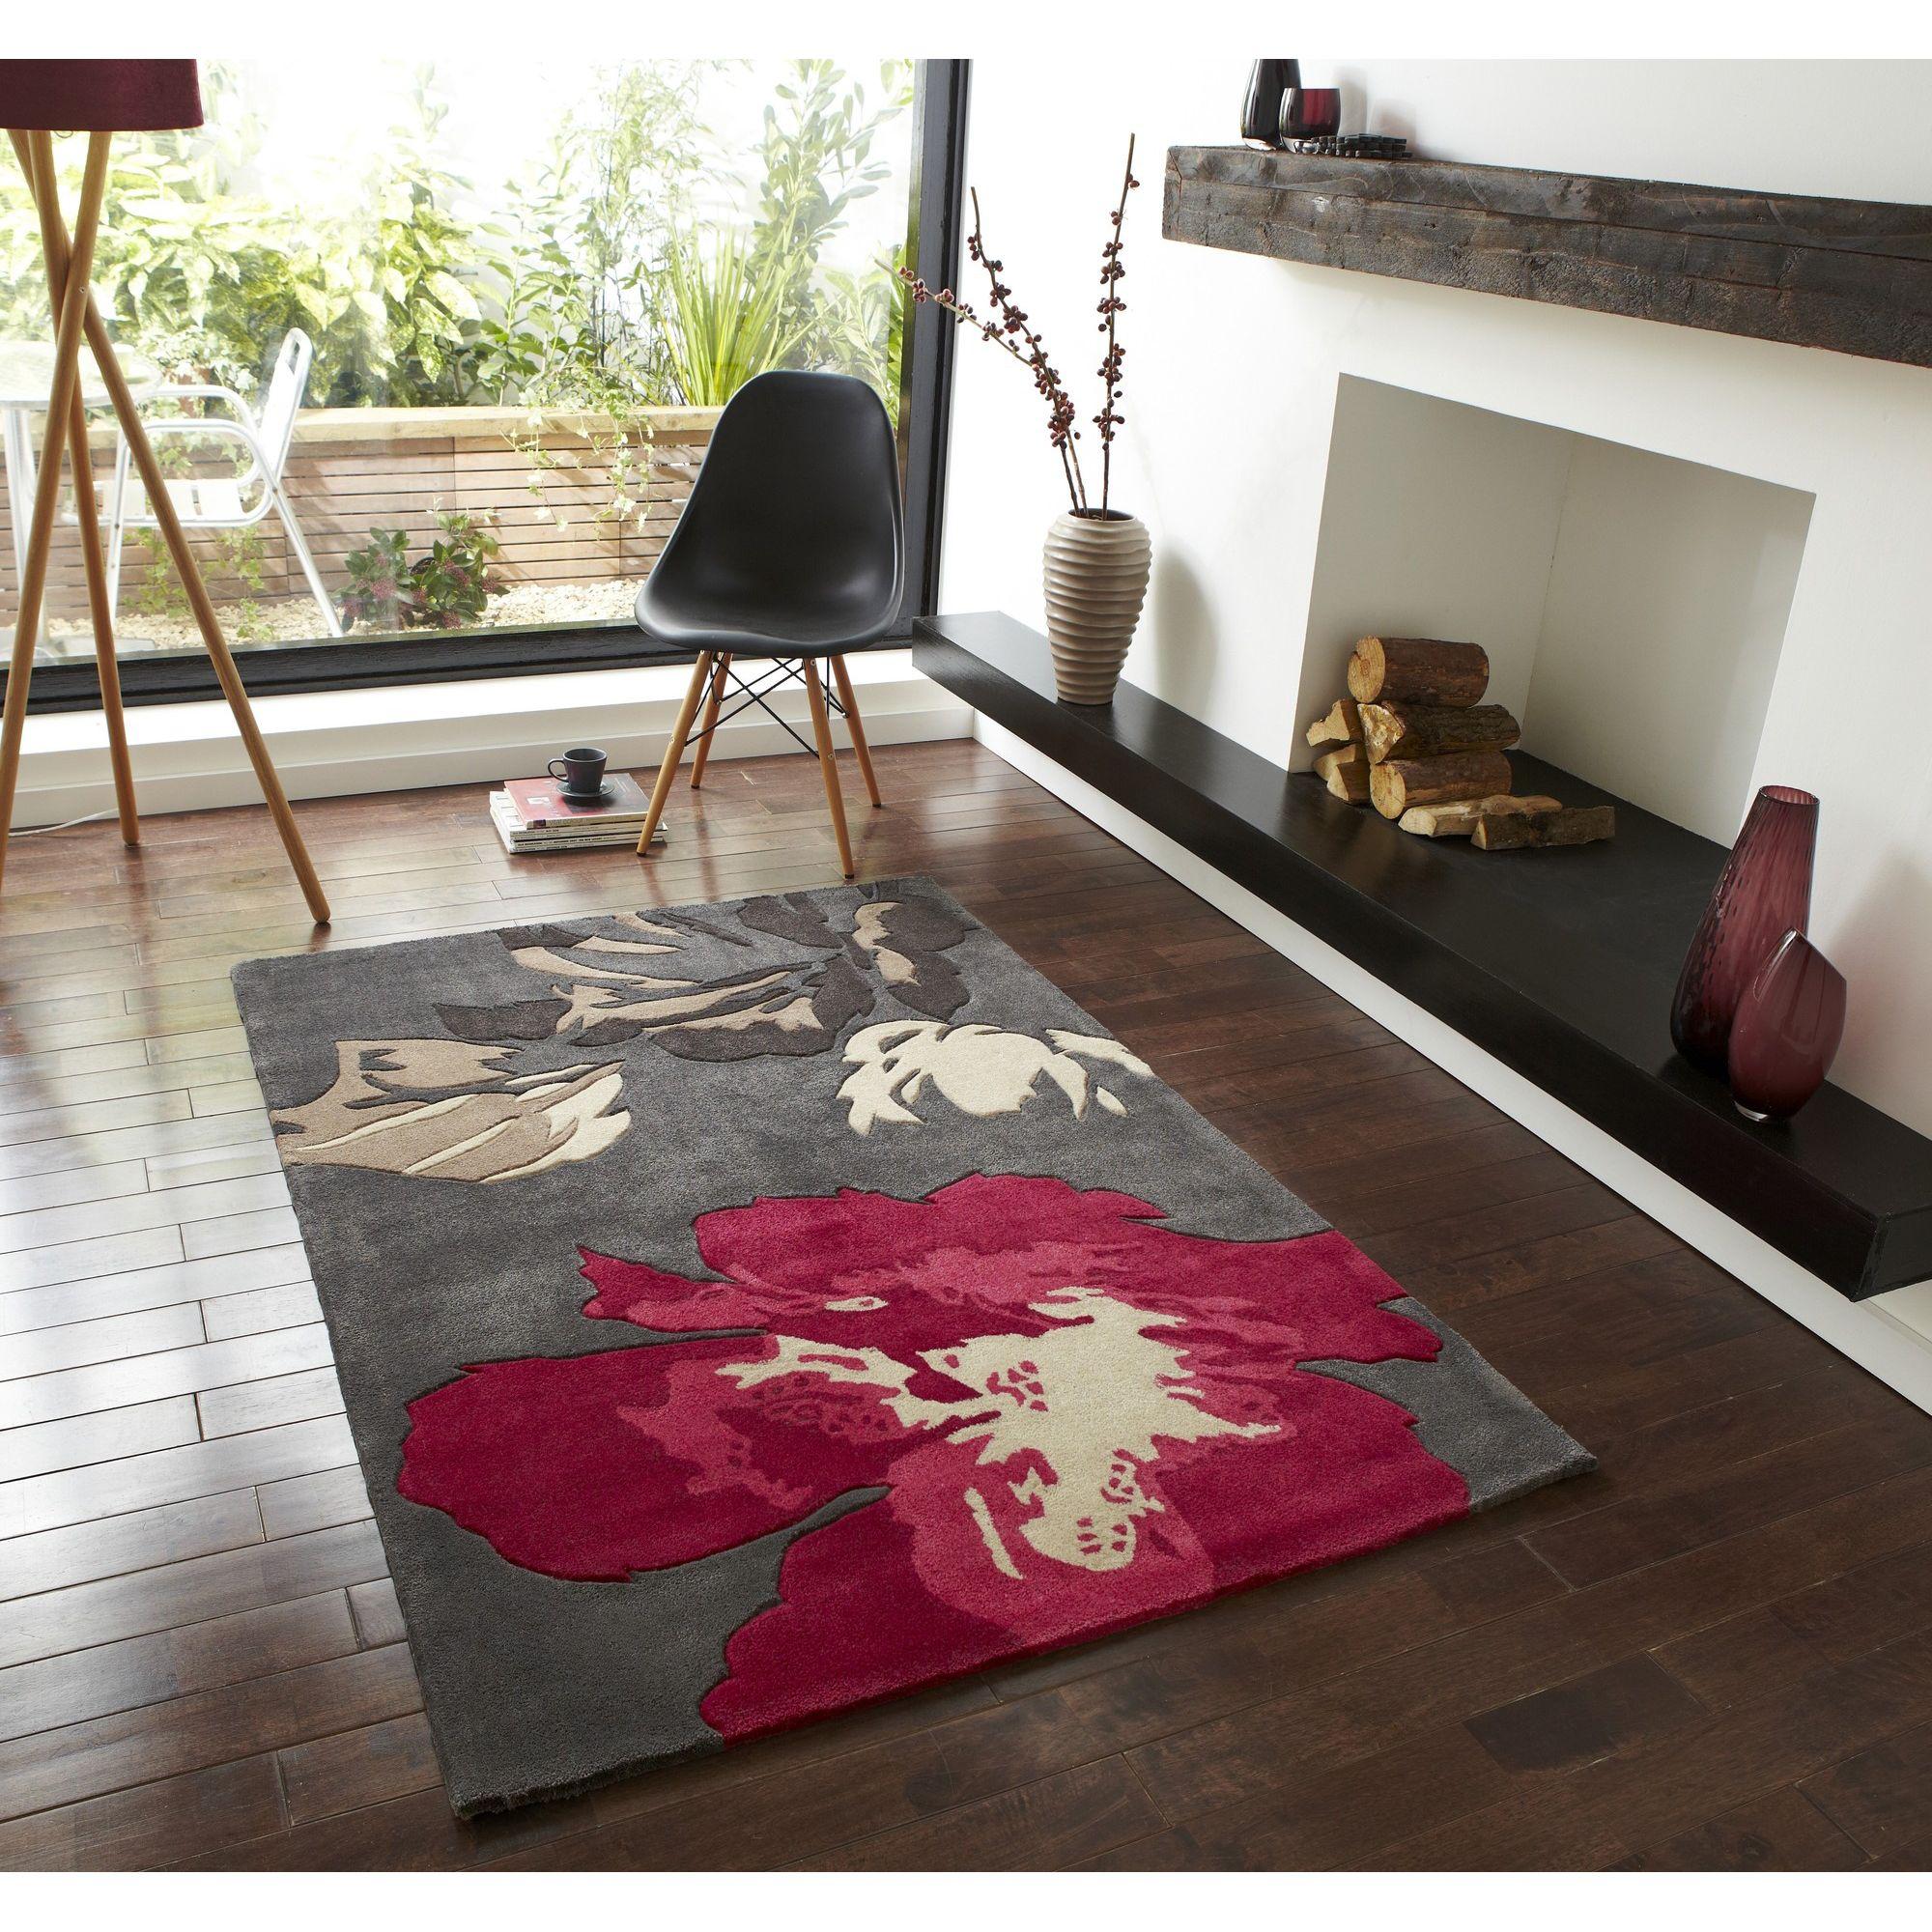 Oriental Carpets & Rugs Hong Kong 2827 Grey/Pink Rug - 90cm x 150cm